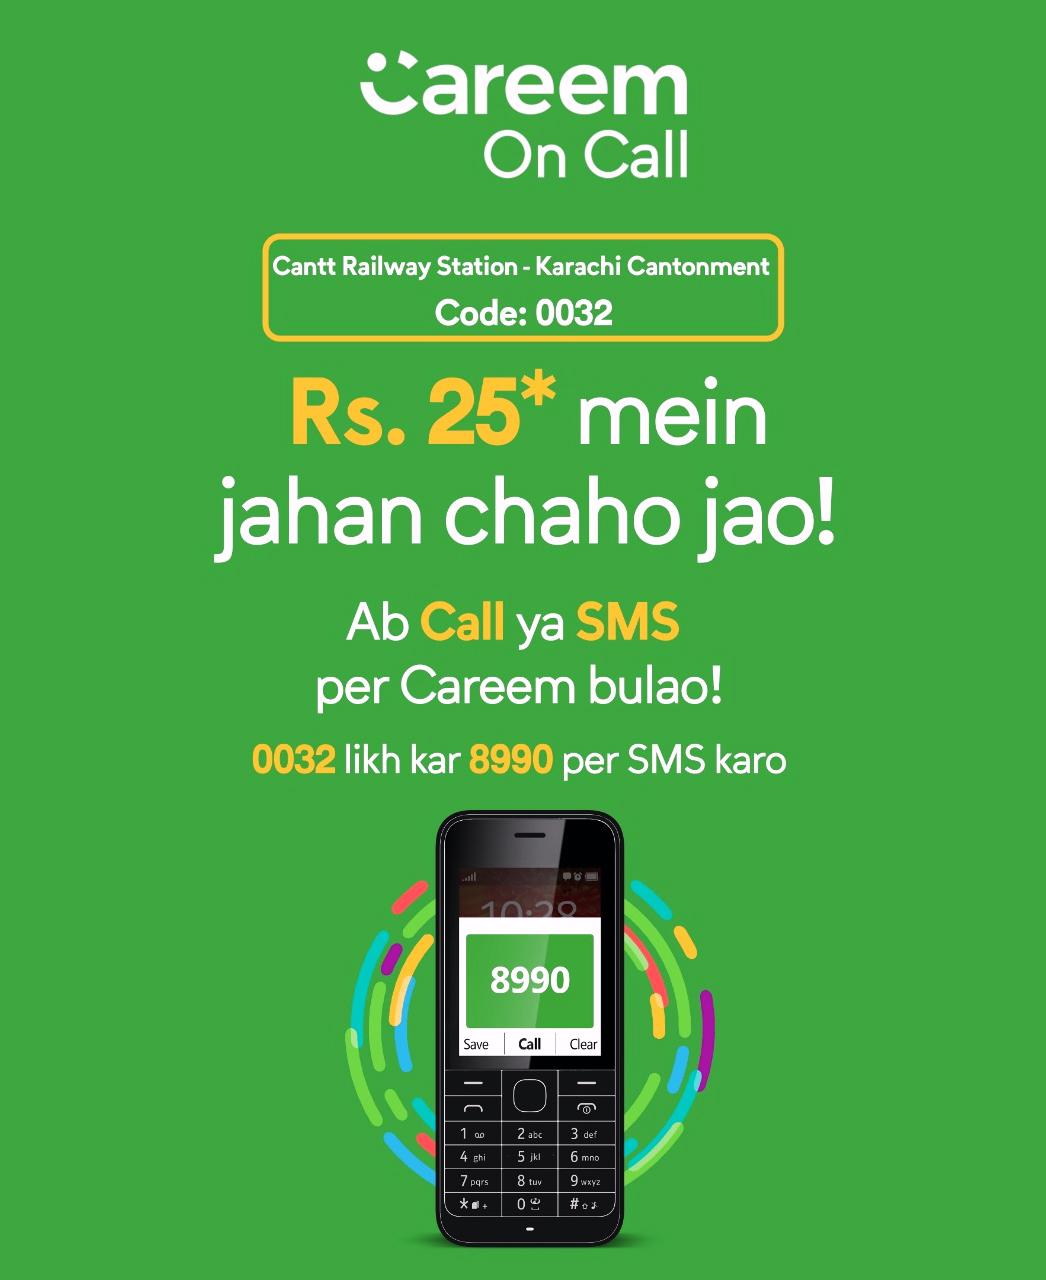 Careem on call service